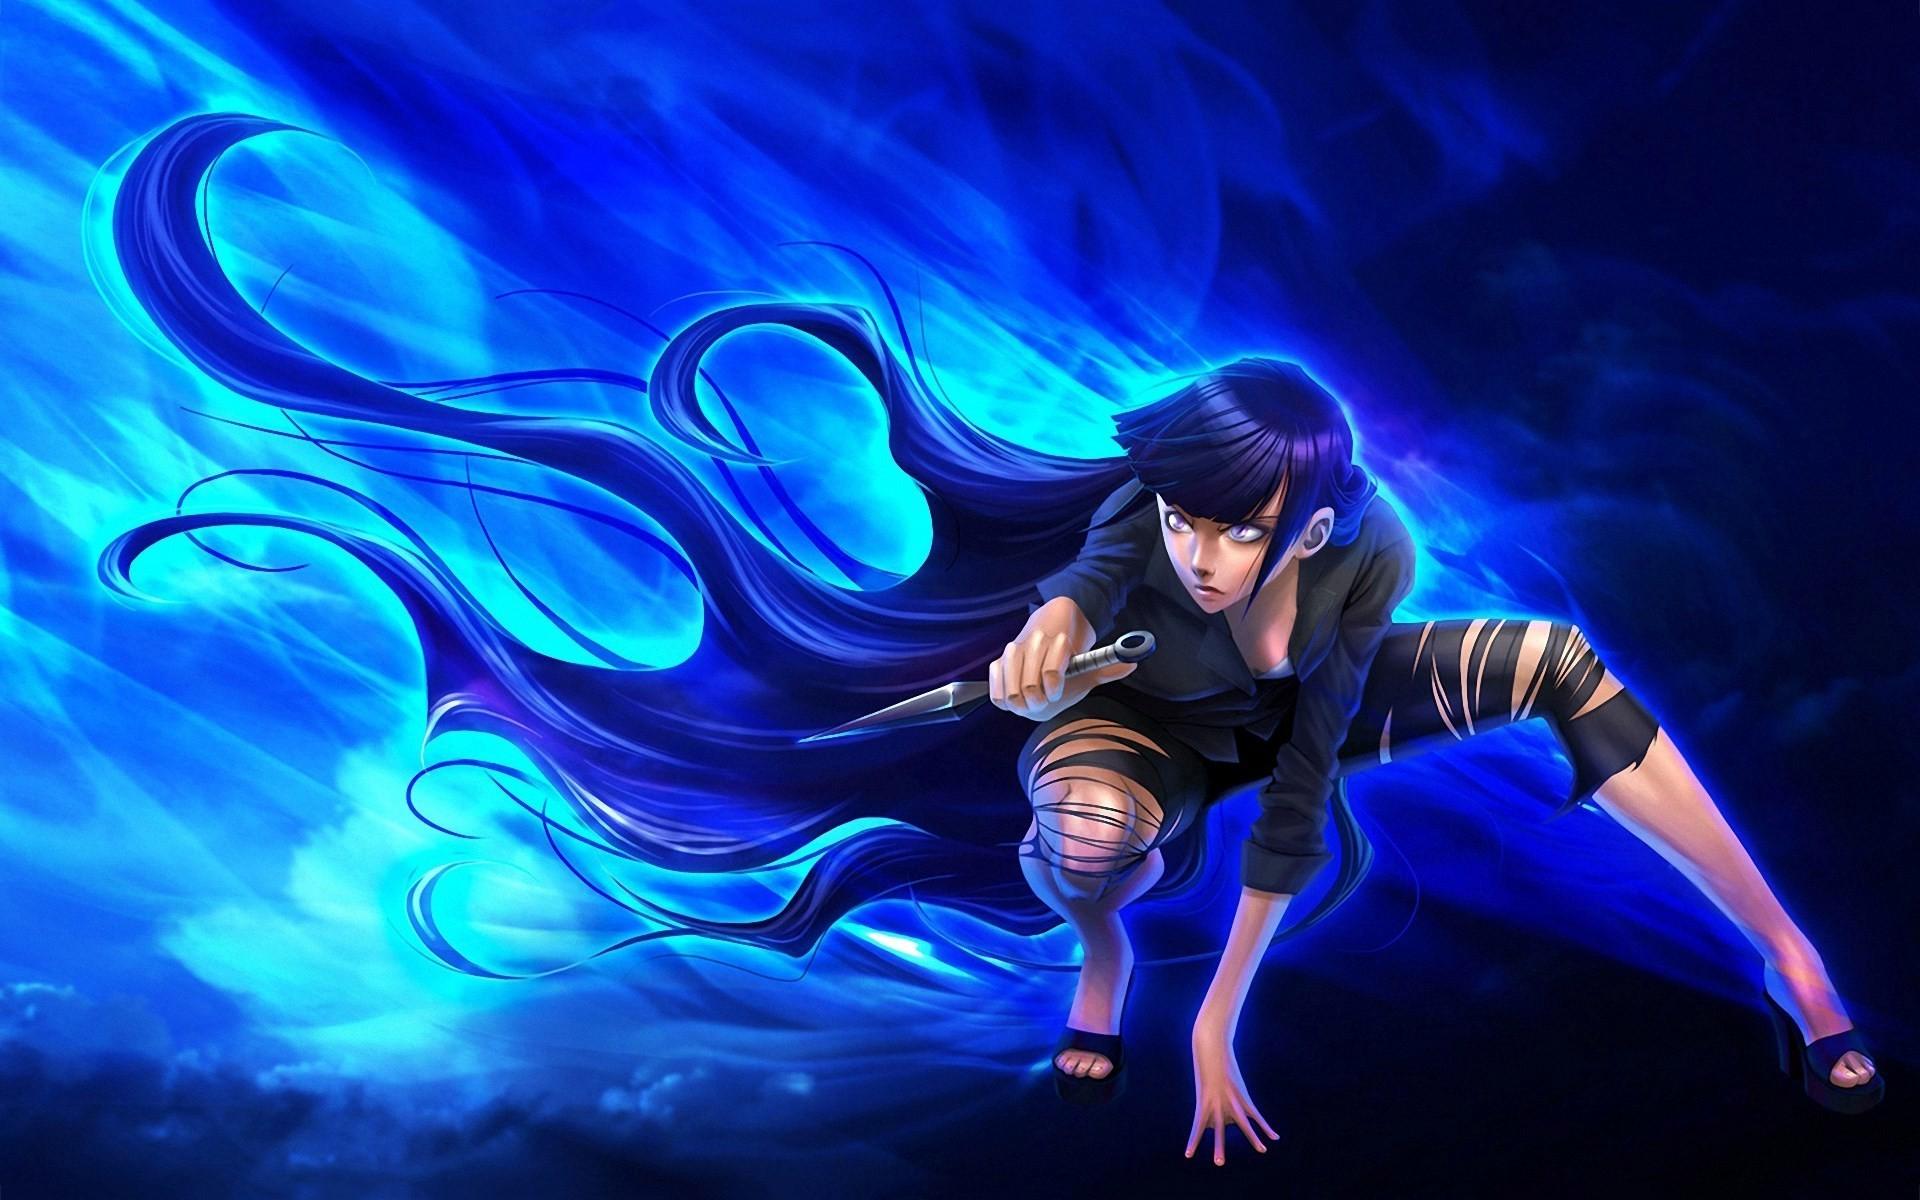 Cool Naruto Wallpapers Hd, Gallery of Naruto HD Backgrounds 1920×1080 Naruto  Wallpapers HD